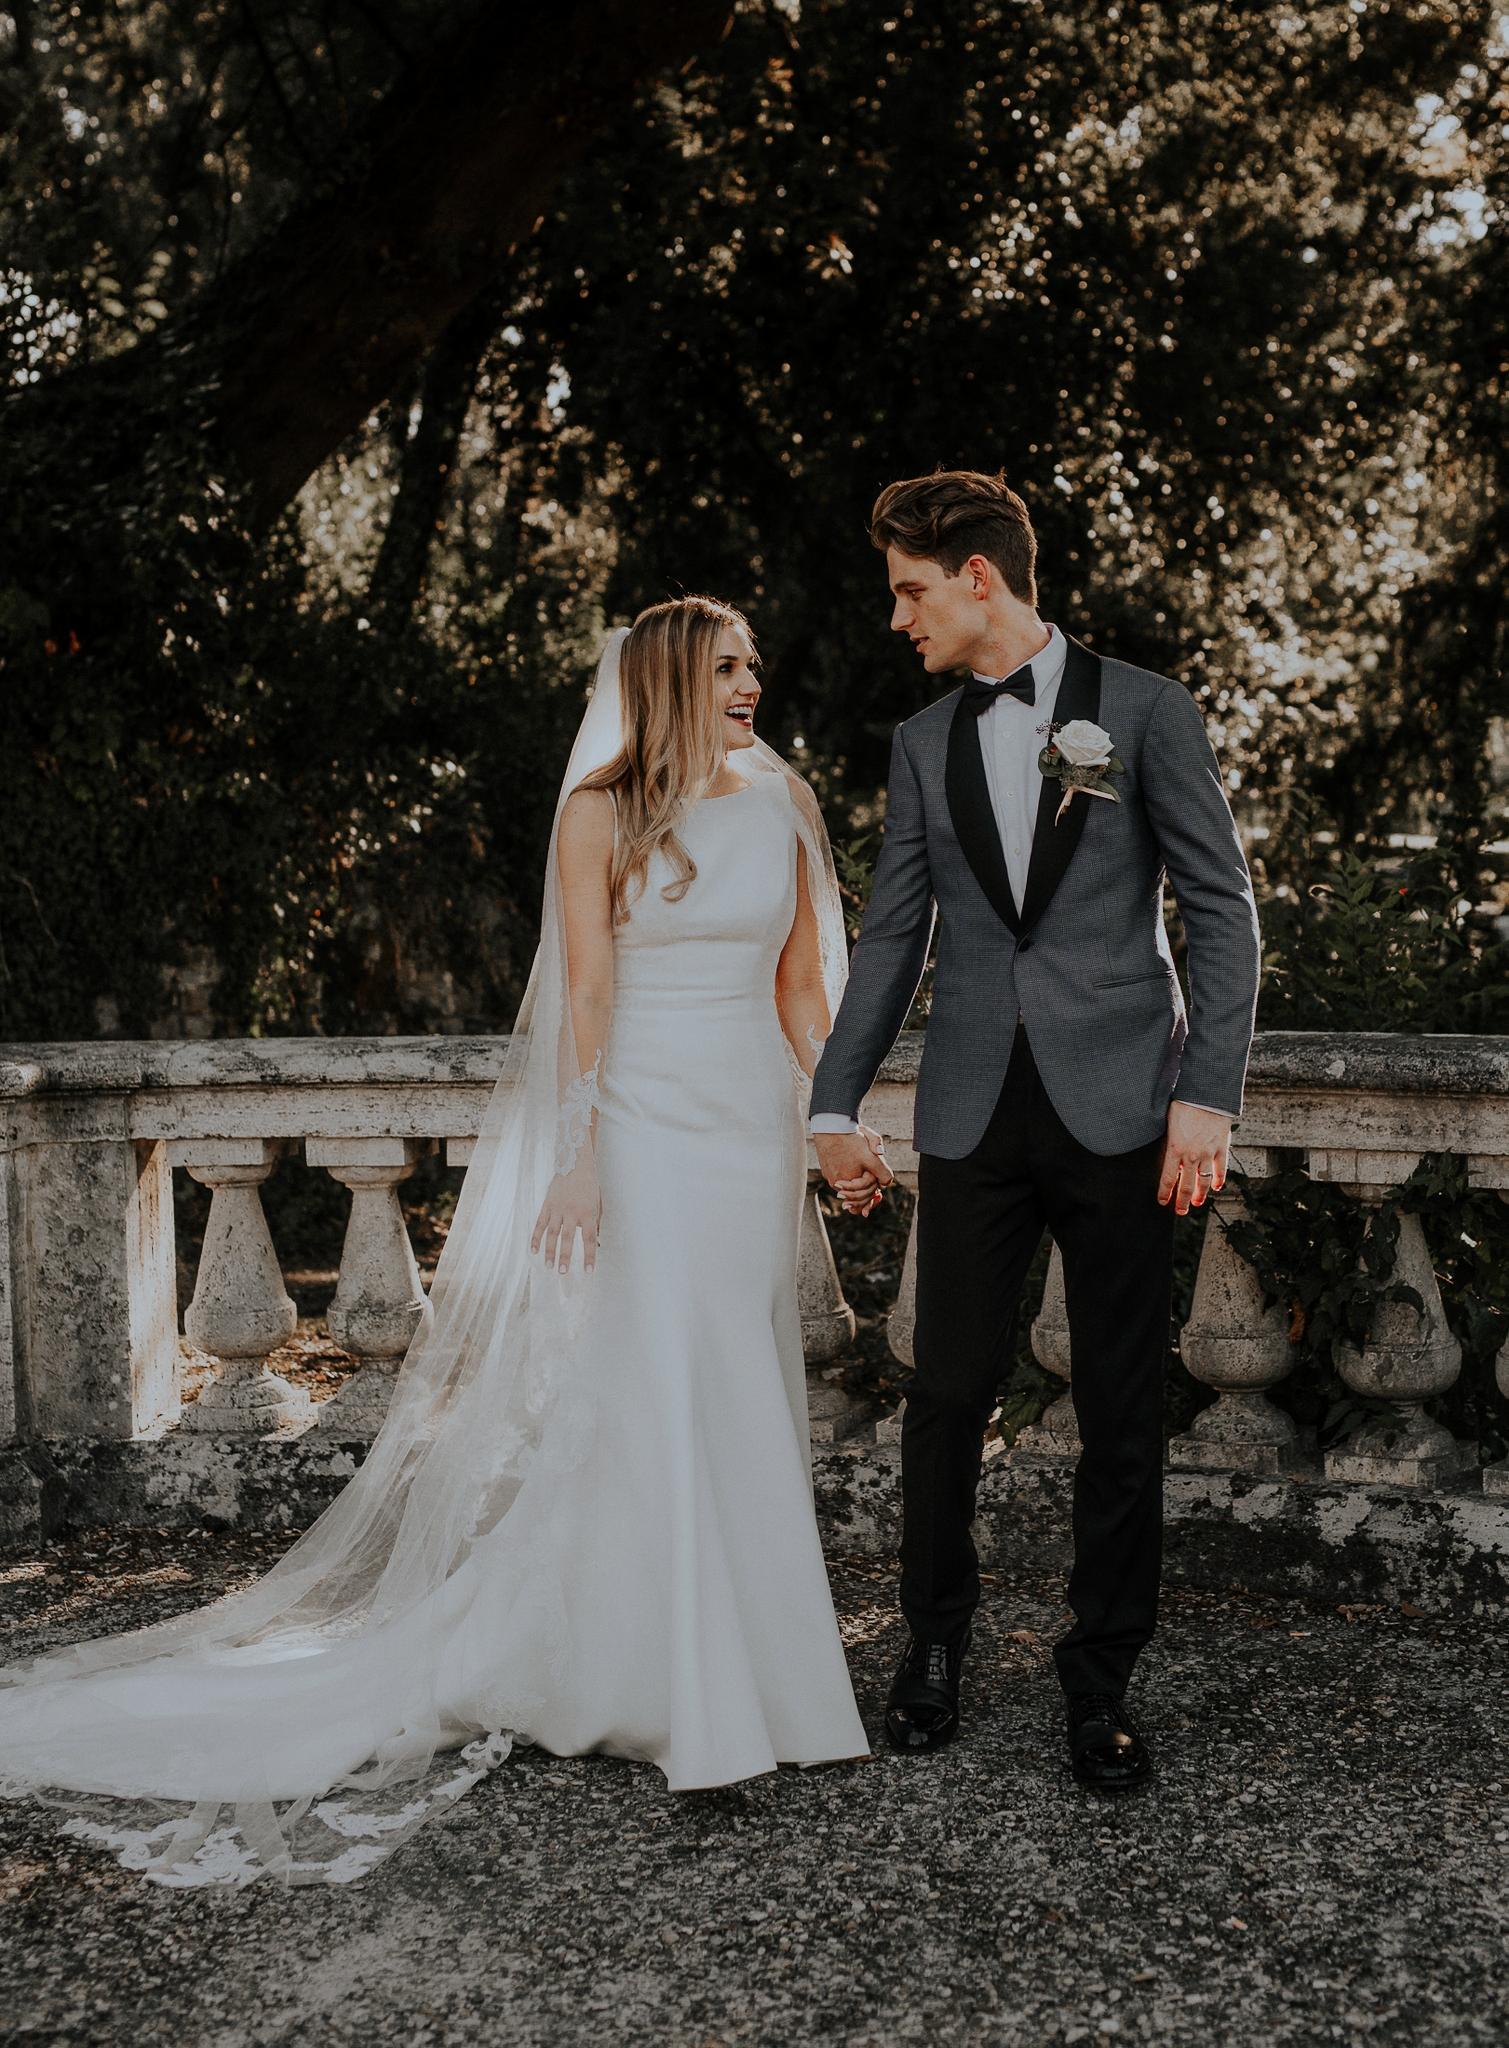 destination-austin-wedding-photographer-italy-florence497.JPG